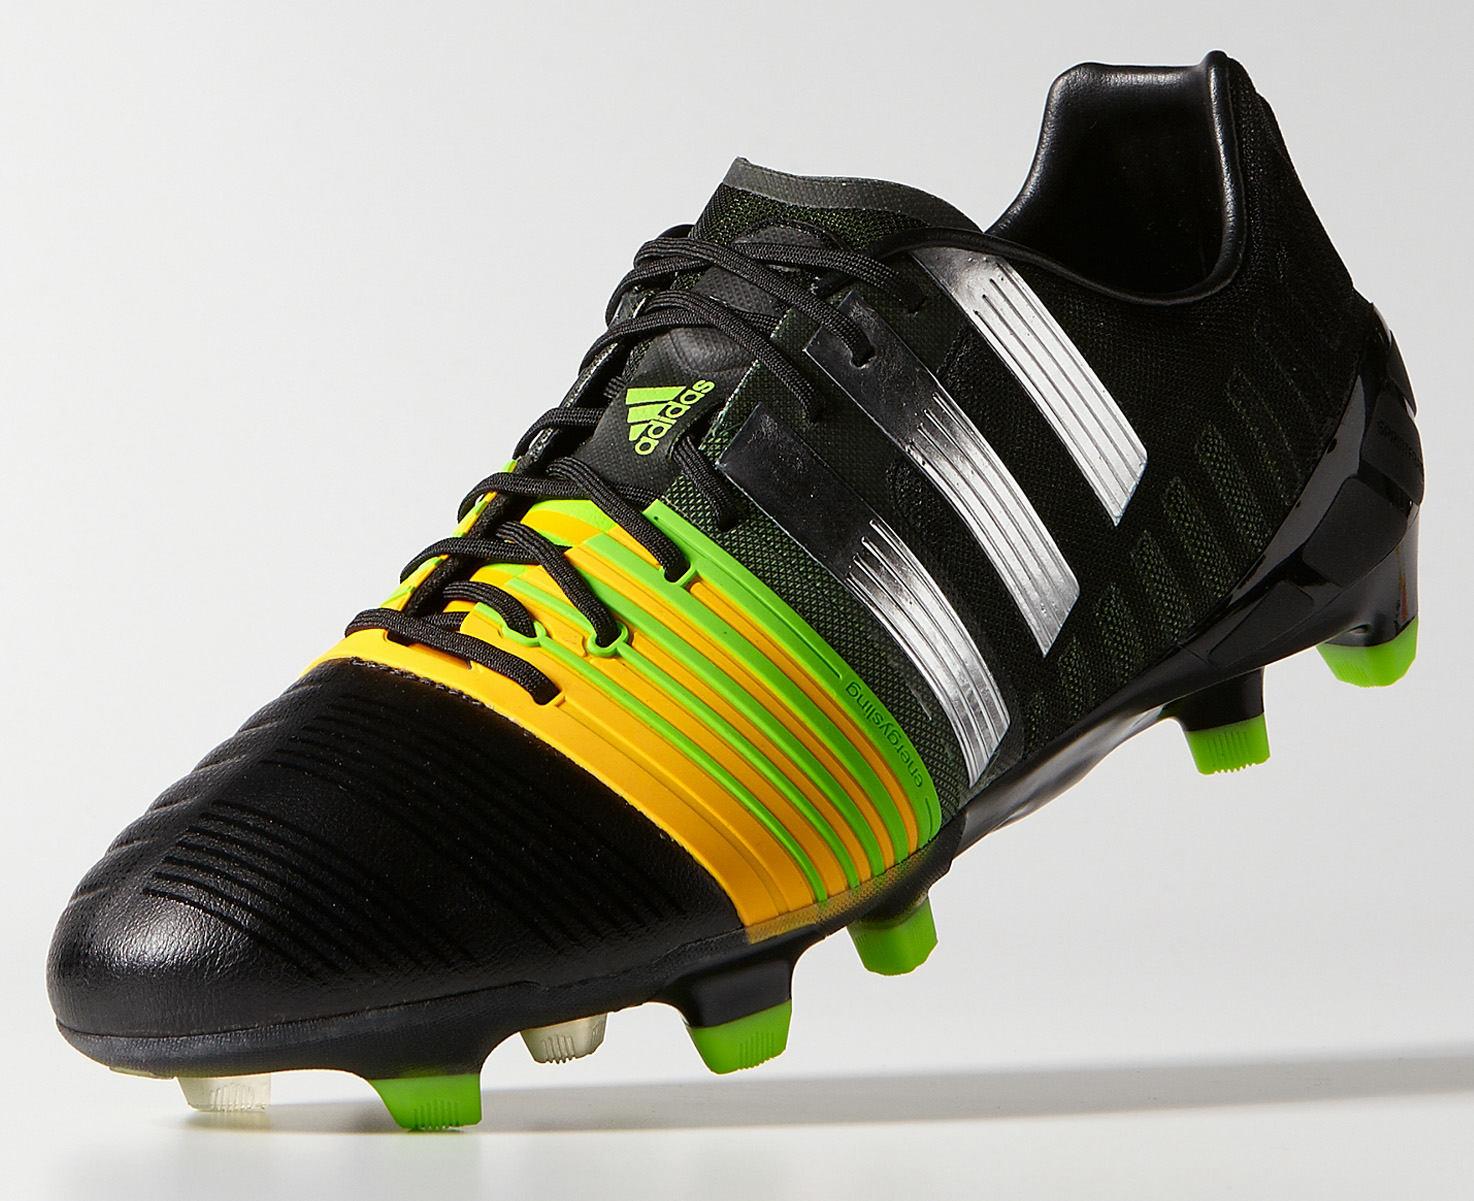 adidas nitrocharge 2 nextgeneration 201415 boot released